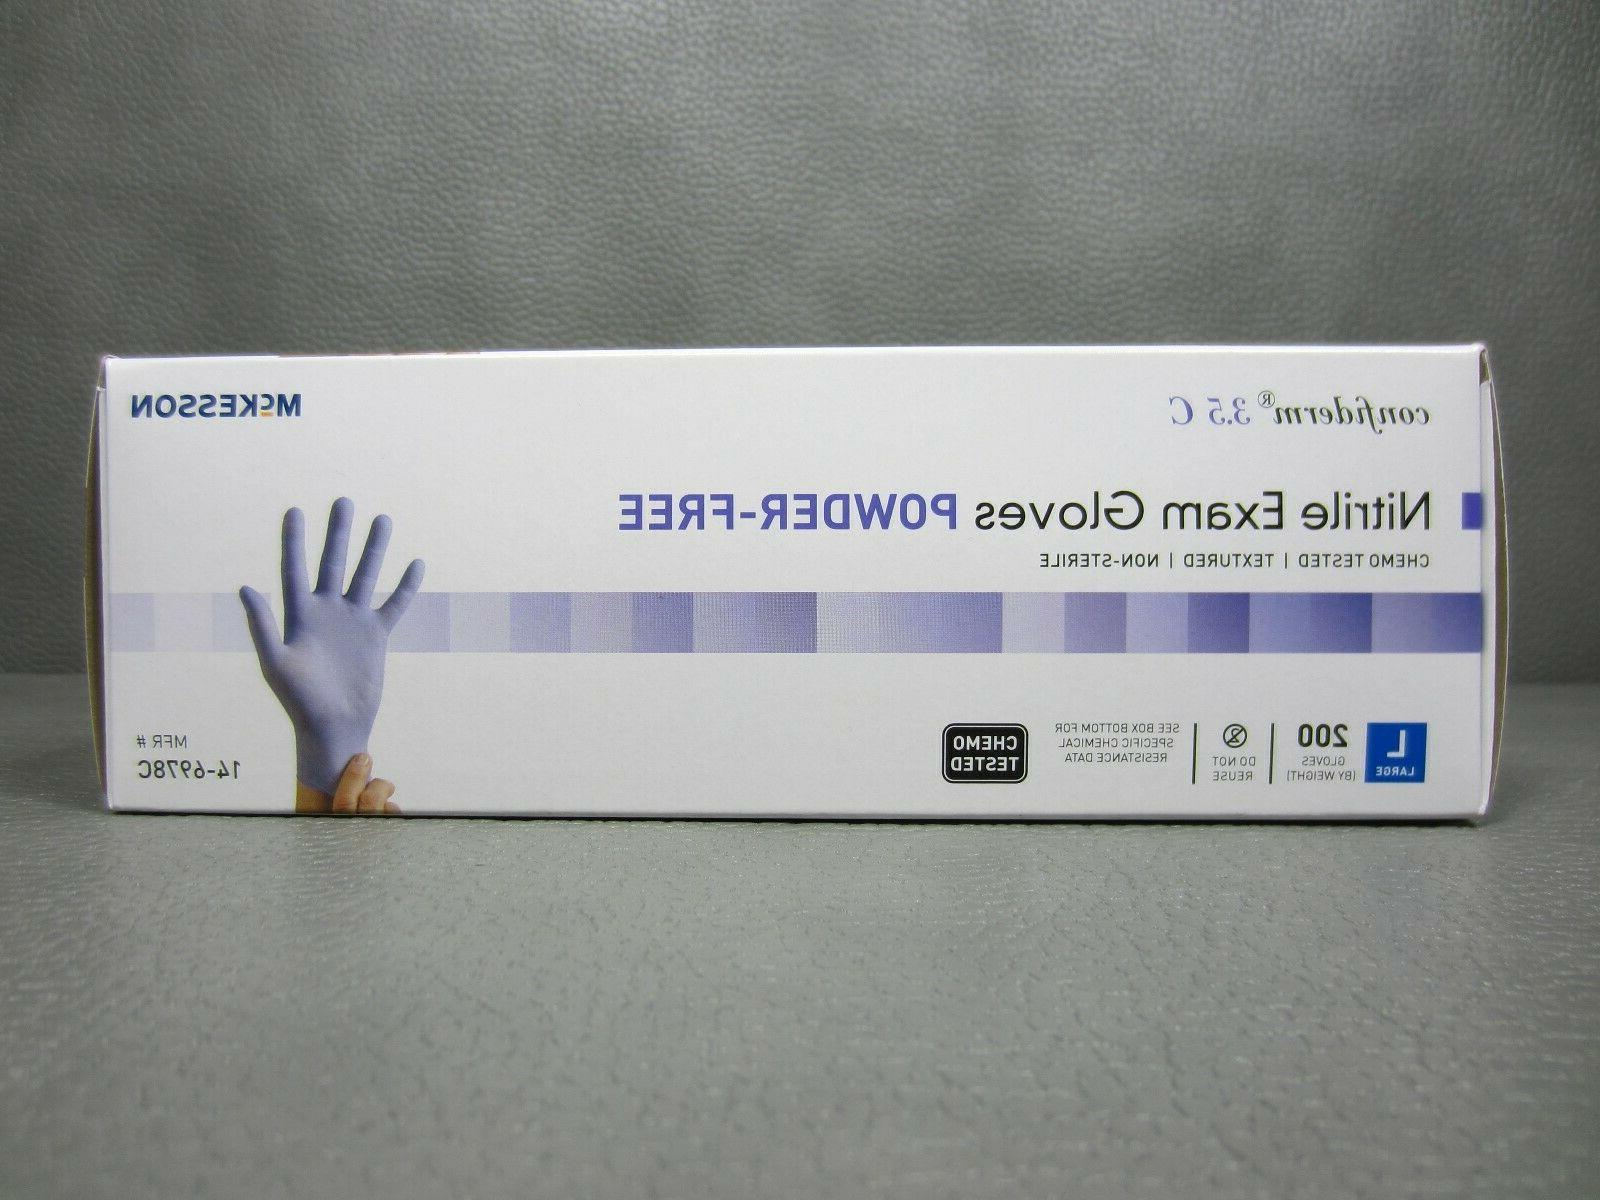 McKesson Confiderm 3.5C Exam Gloves Chemo Tested of 200